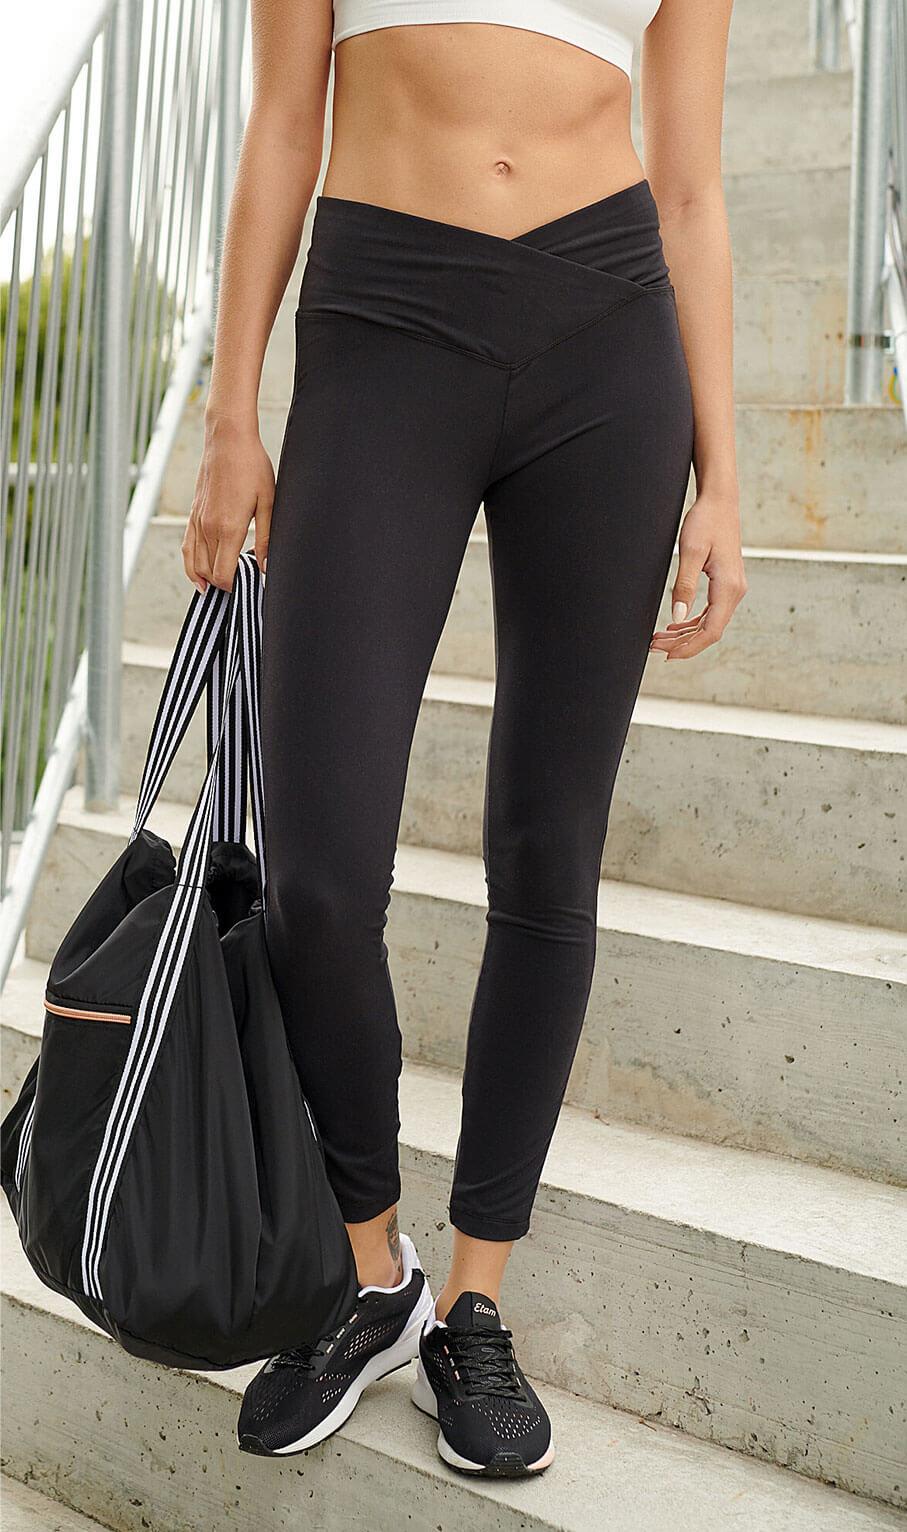 Etam - Legging de sport long